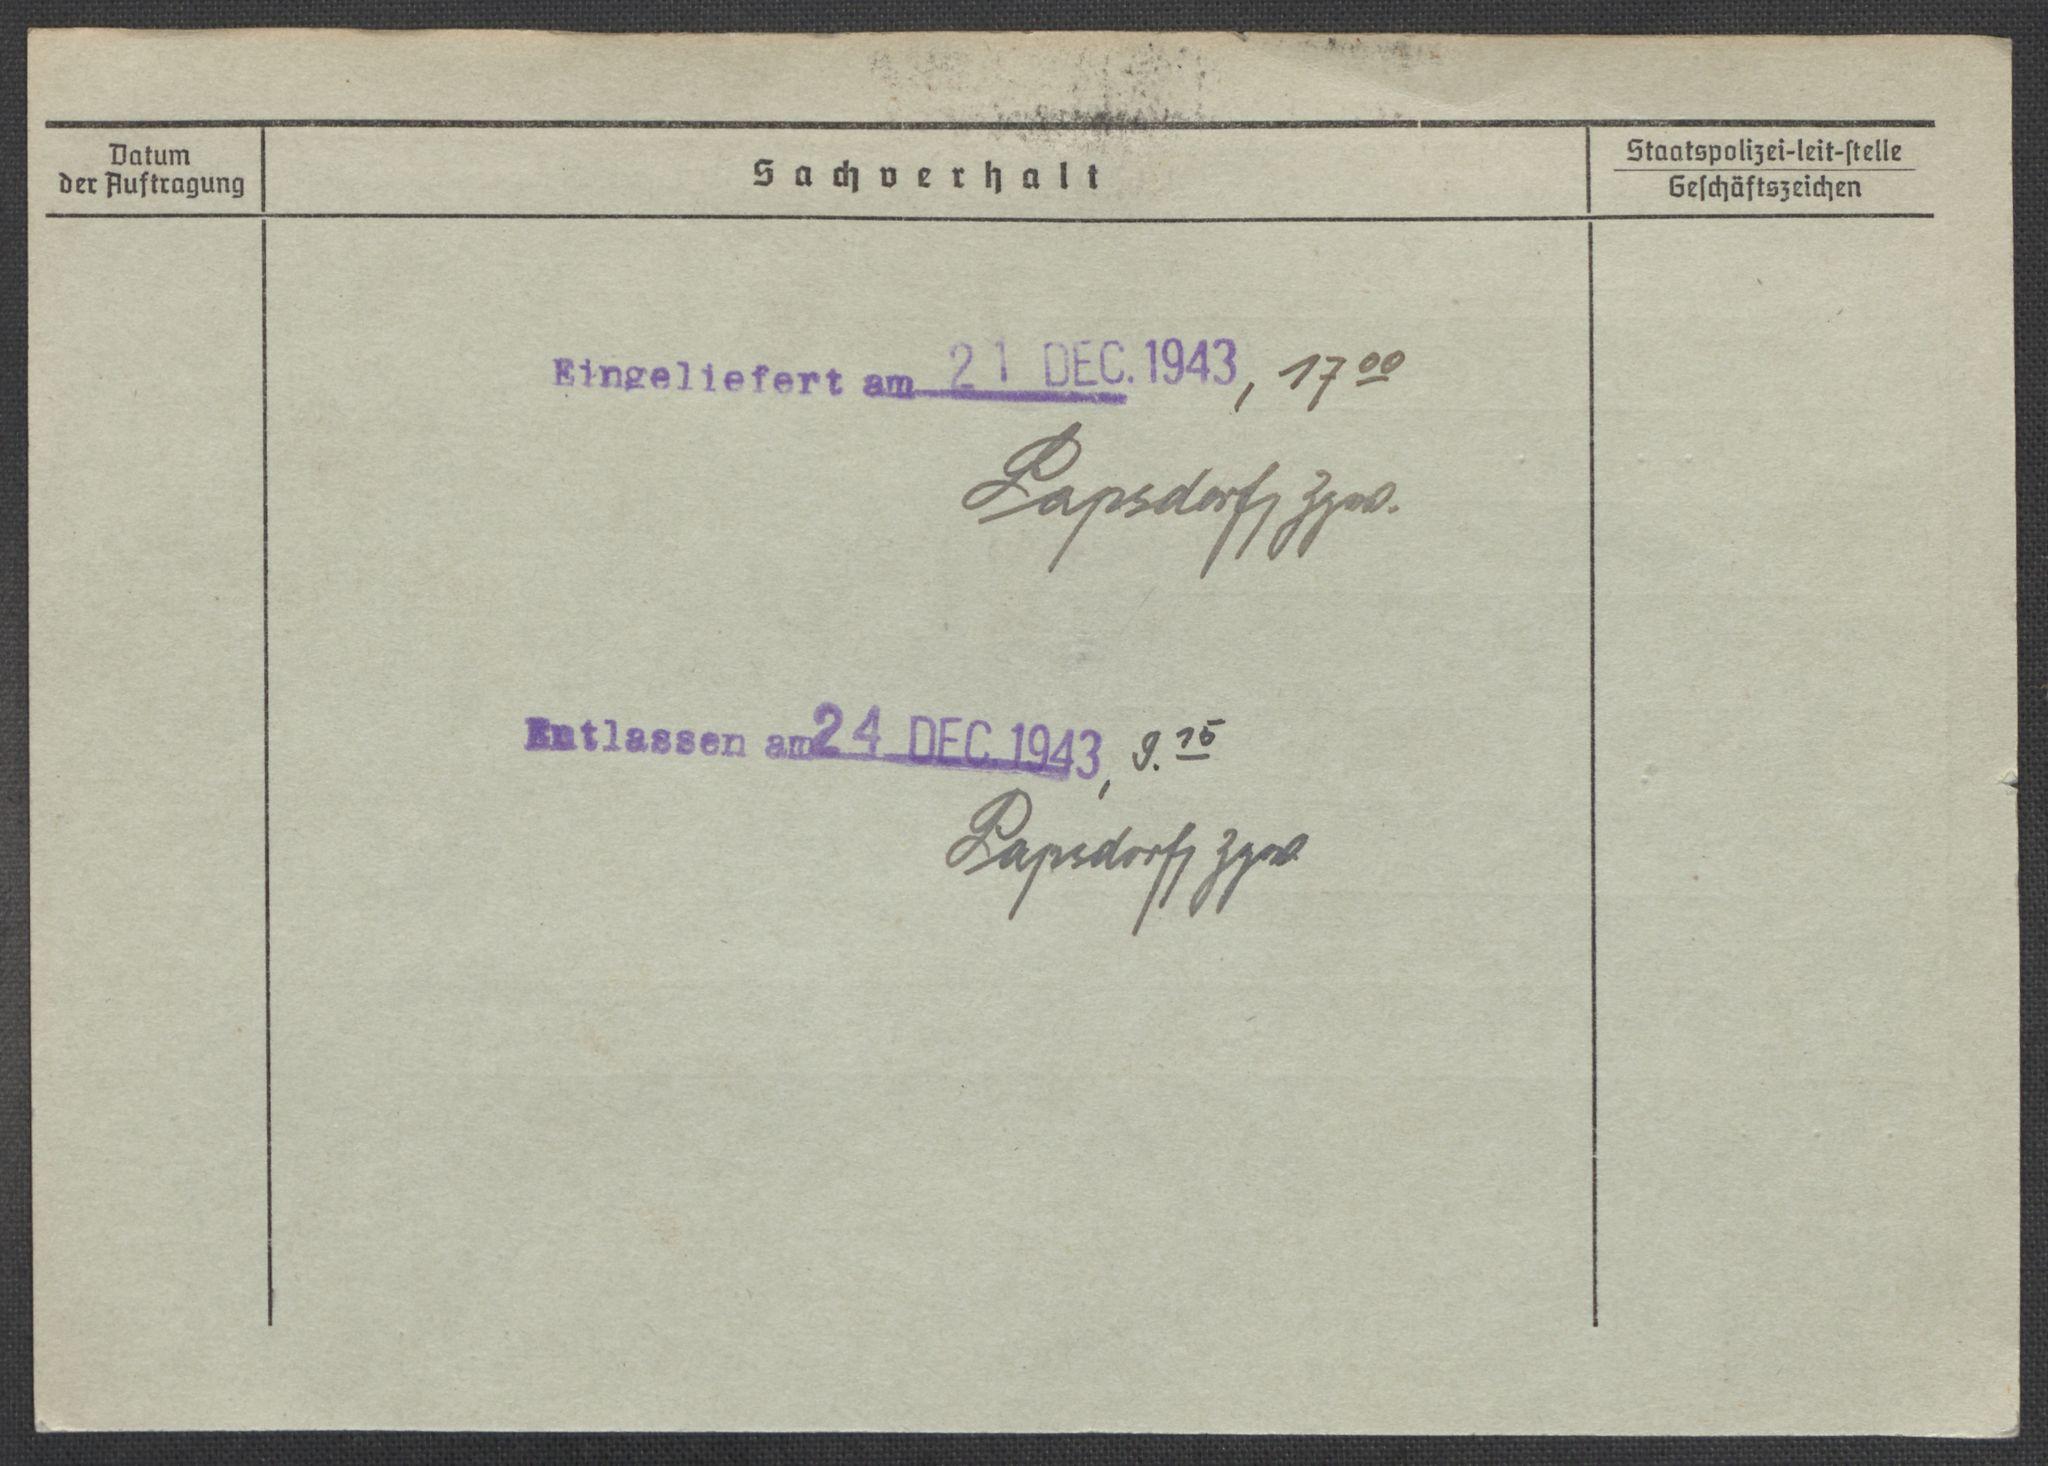 RA, Befehlshaber der Sicherheitspolizei und des SD, E/Ea/Eaa/L0005: Register over norske fanger i Møllergata 19: Hø-Kj, 1940-1945, s. 586